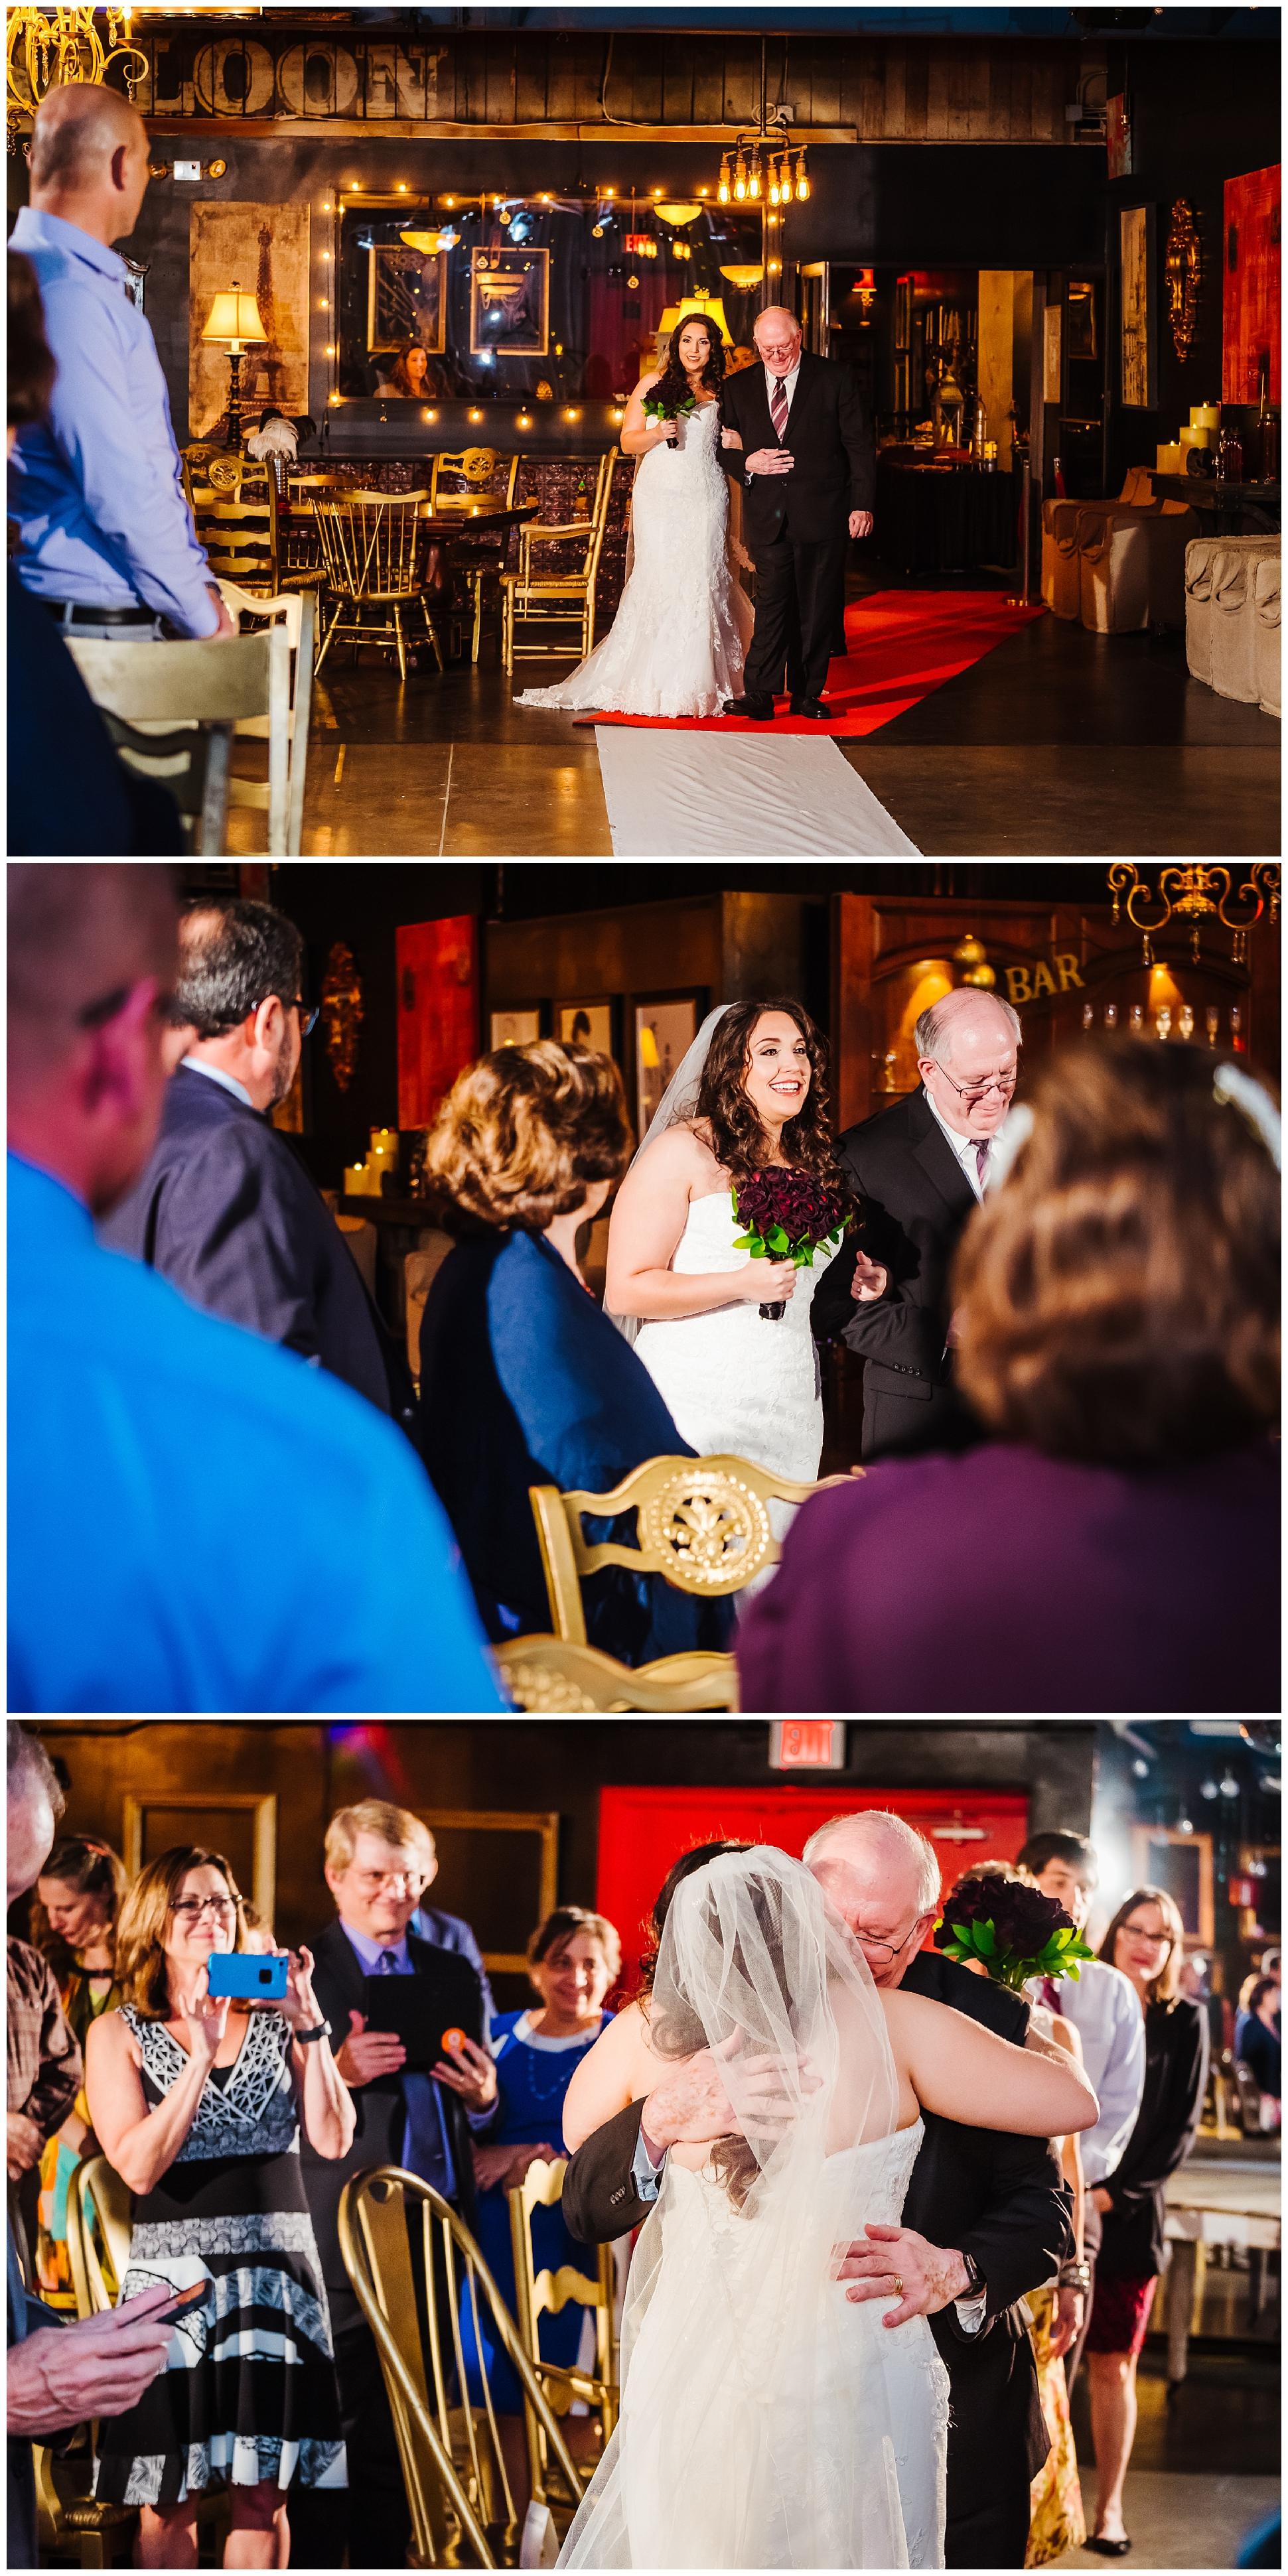 tampa-wedding-photographer-unique-indoor-venue_0024.jpg